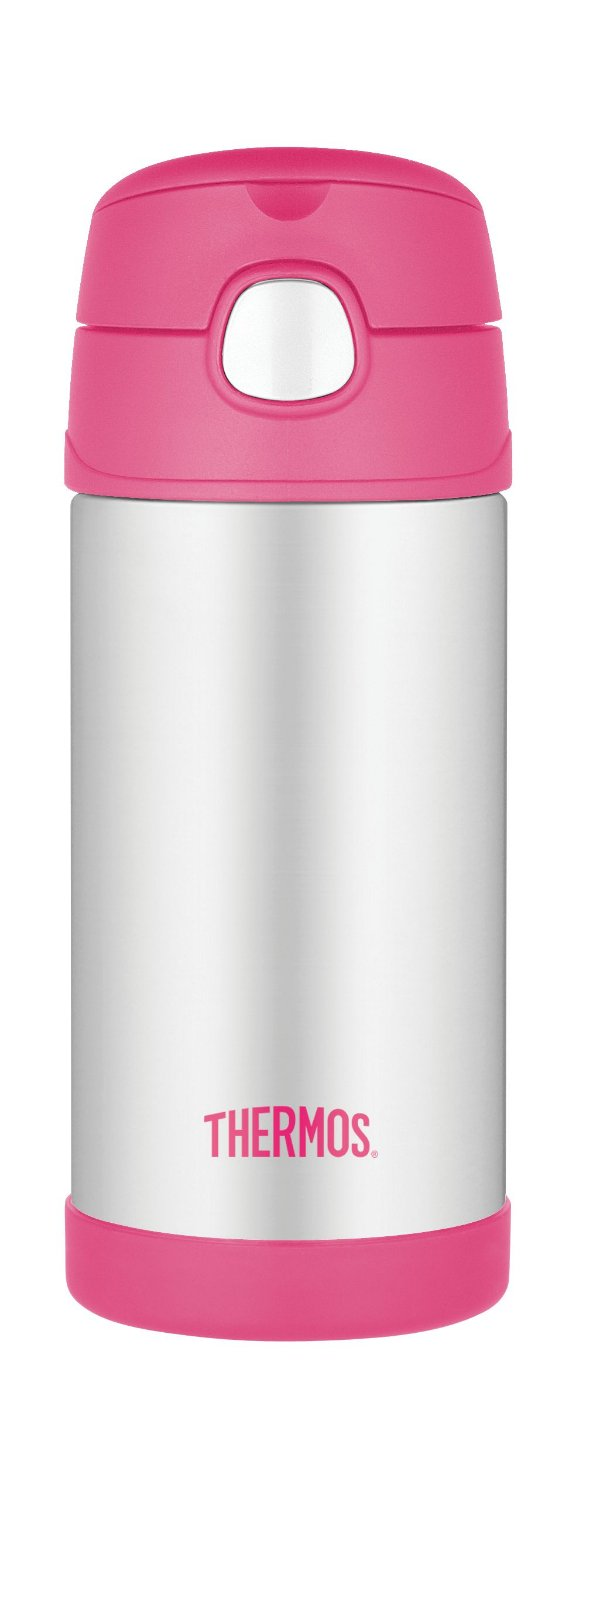 Garrafinha Térmica Funtainer Rosa e Inox - Thermos